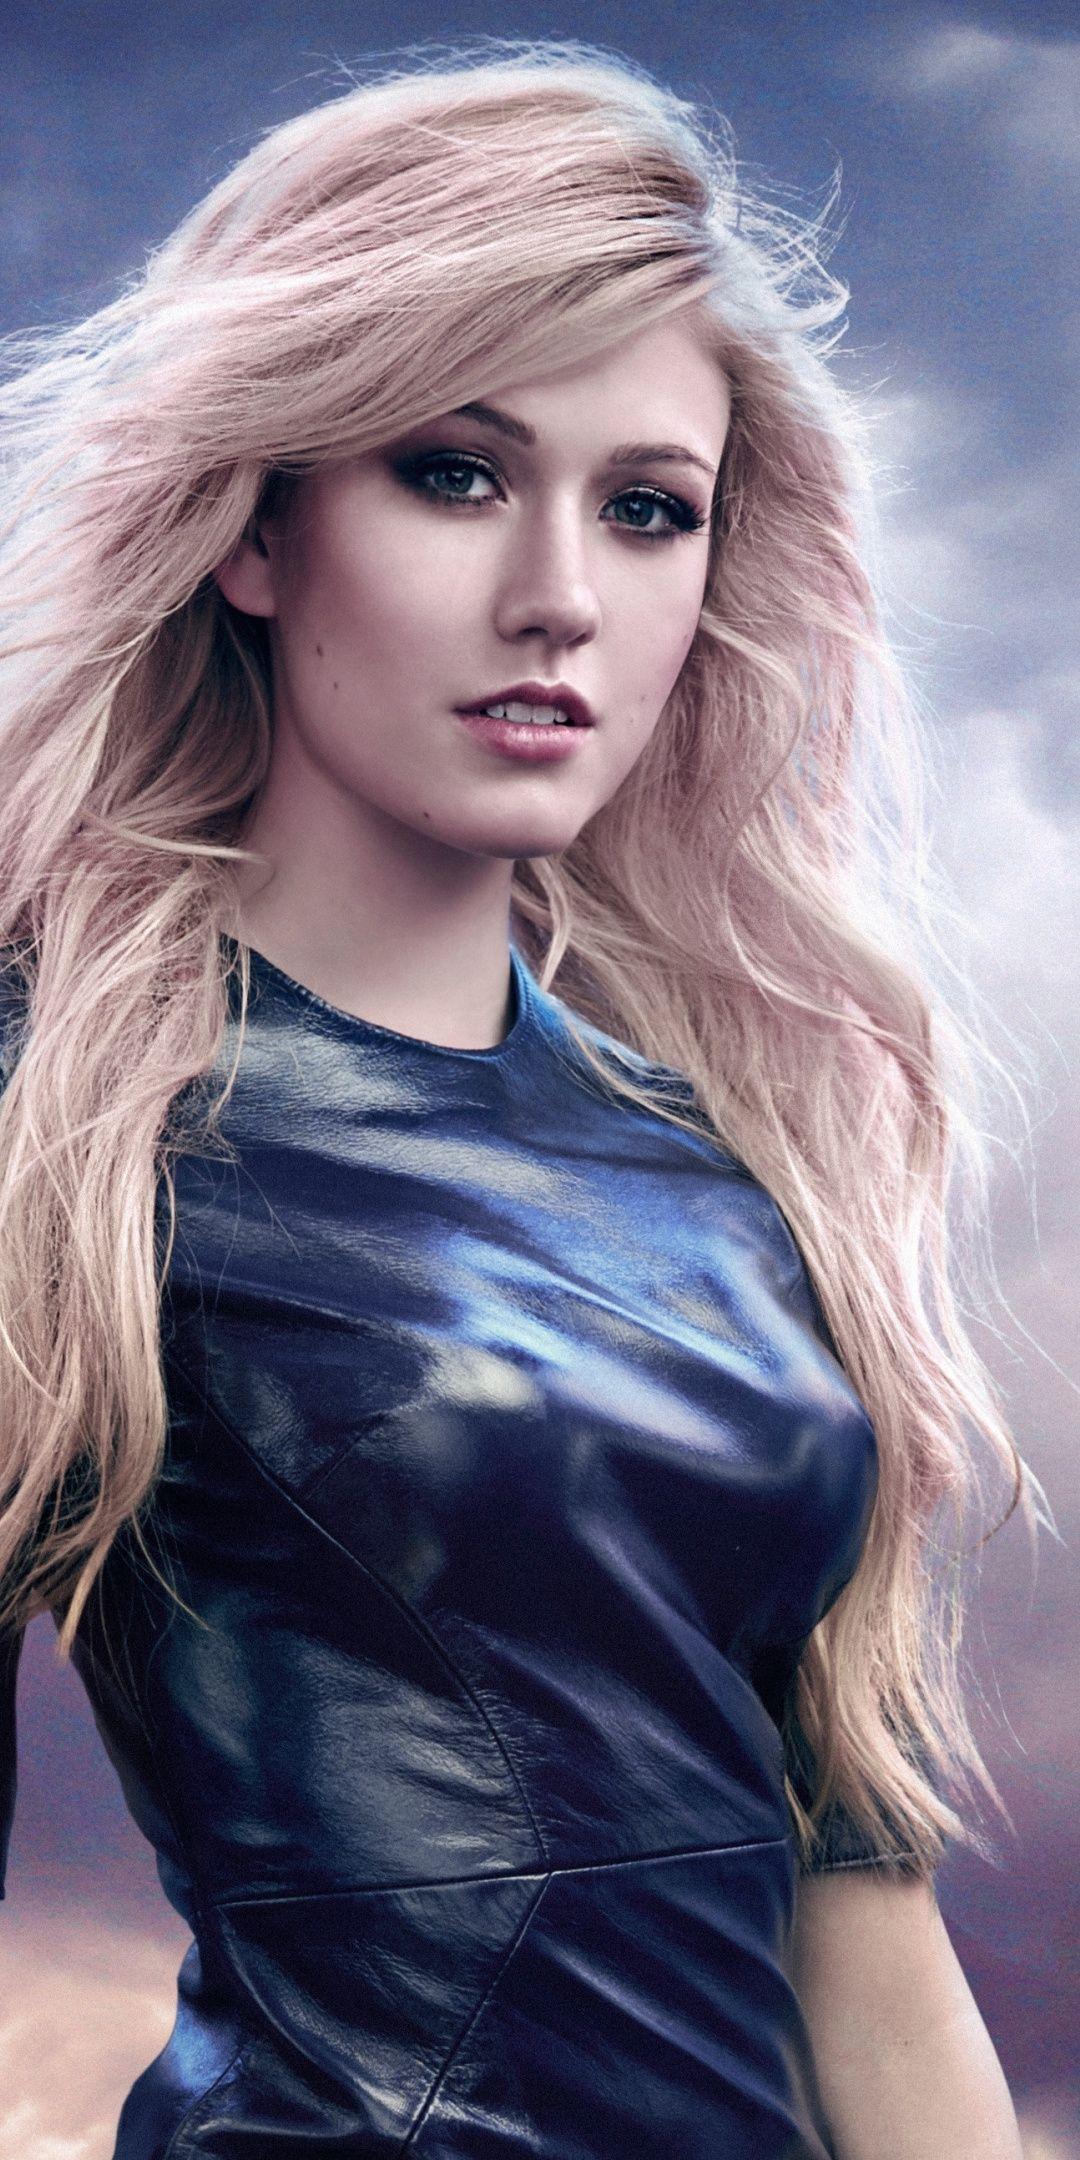 Katherine Mcnamara Blue Dress 2019 1080x2160 Wallpaper